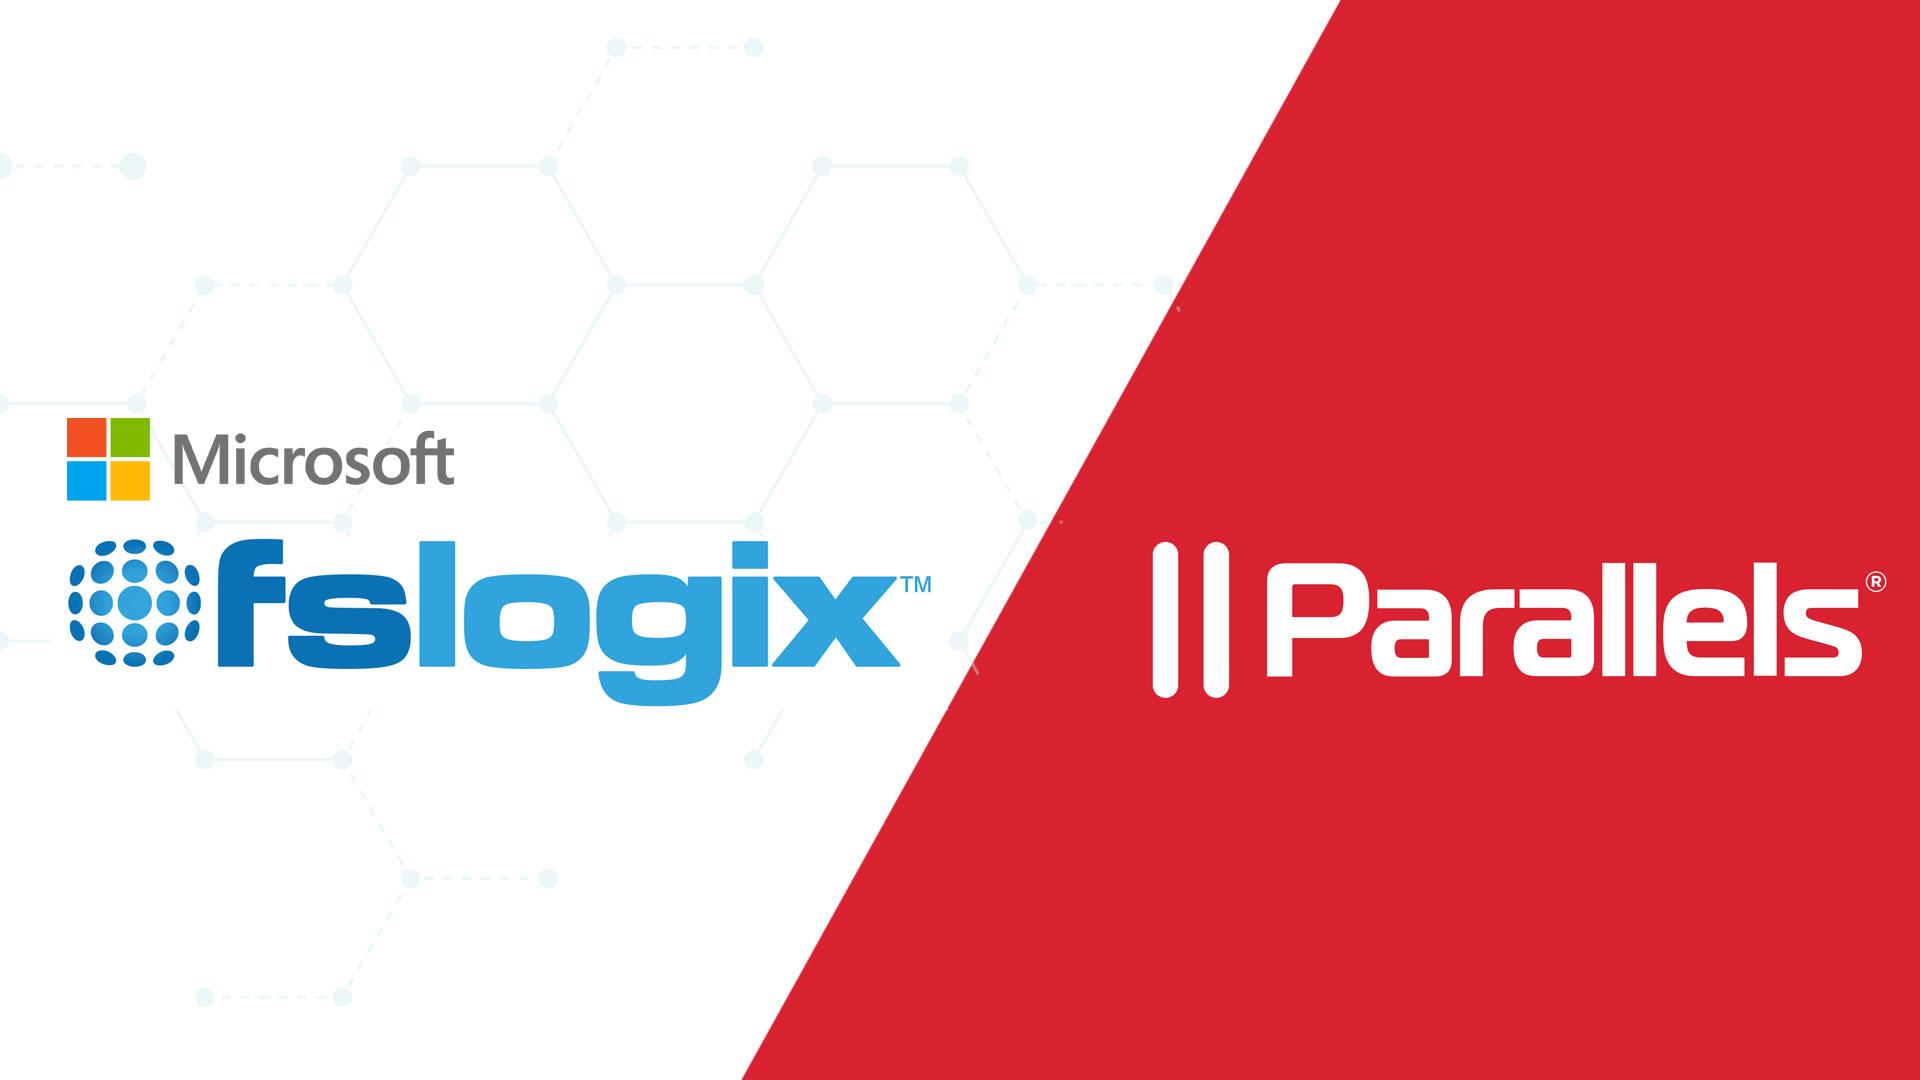 Parallels RAS FSLogix Microsoft